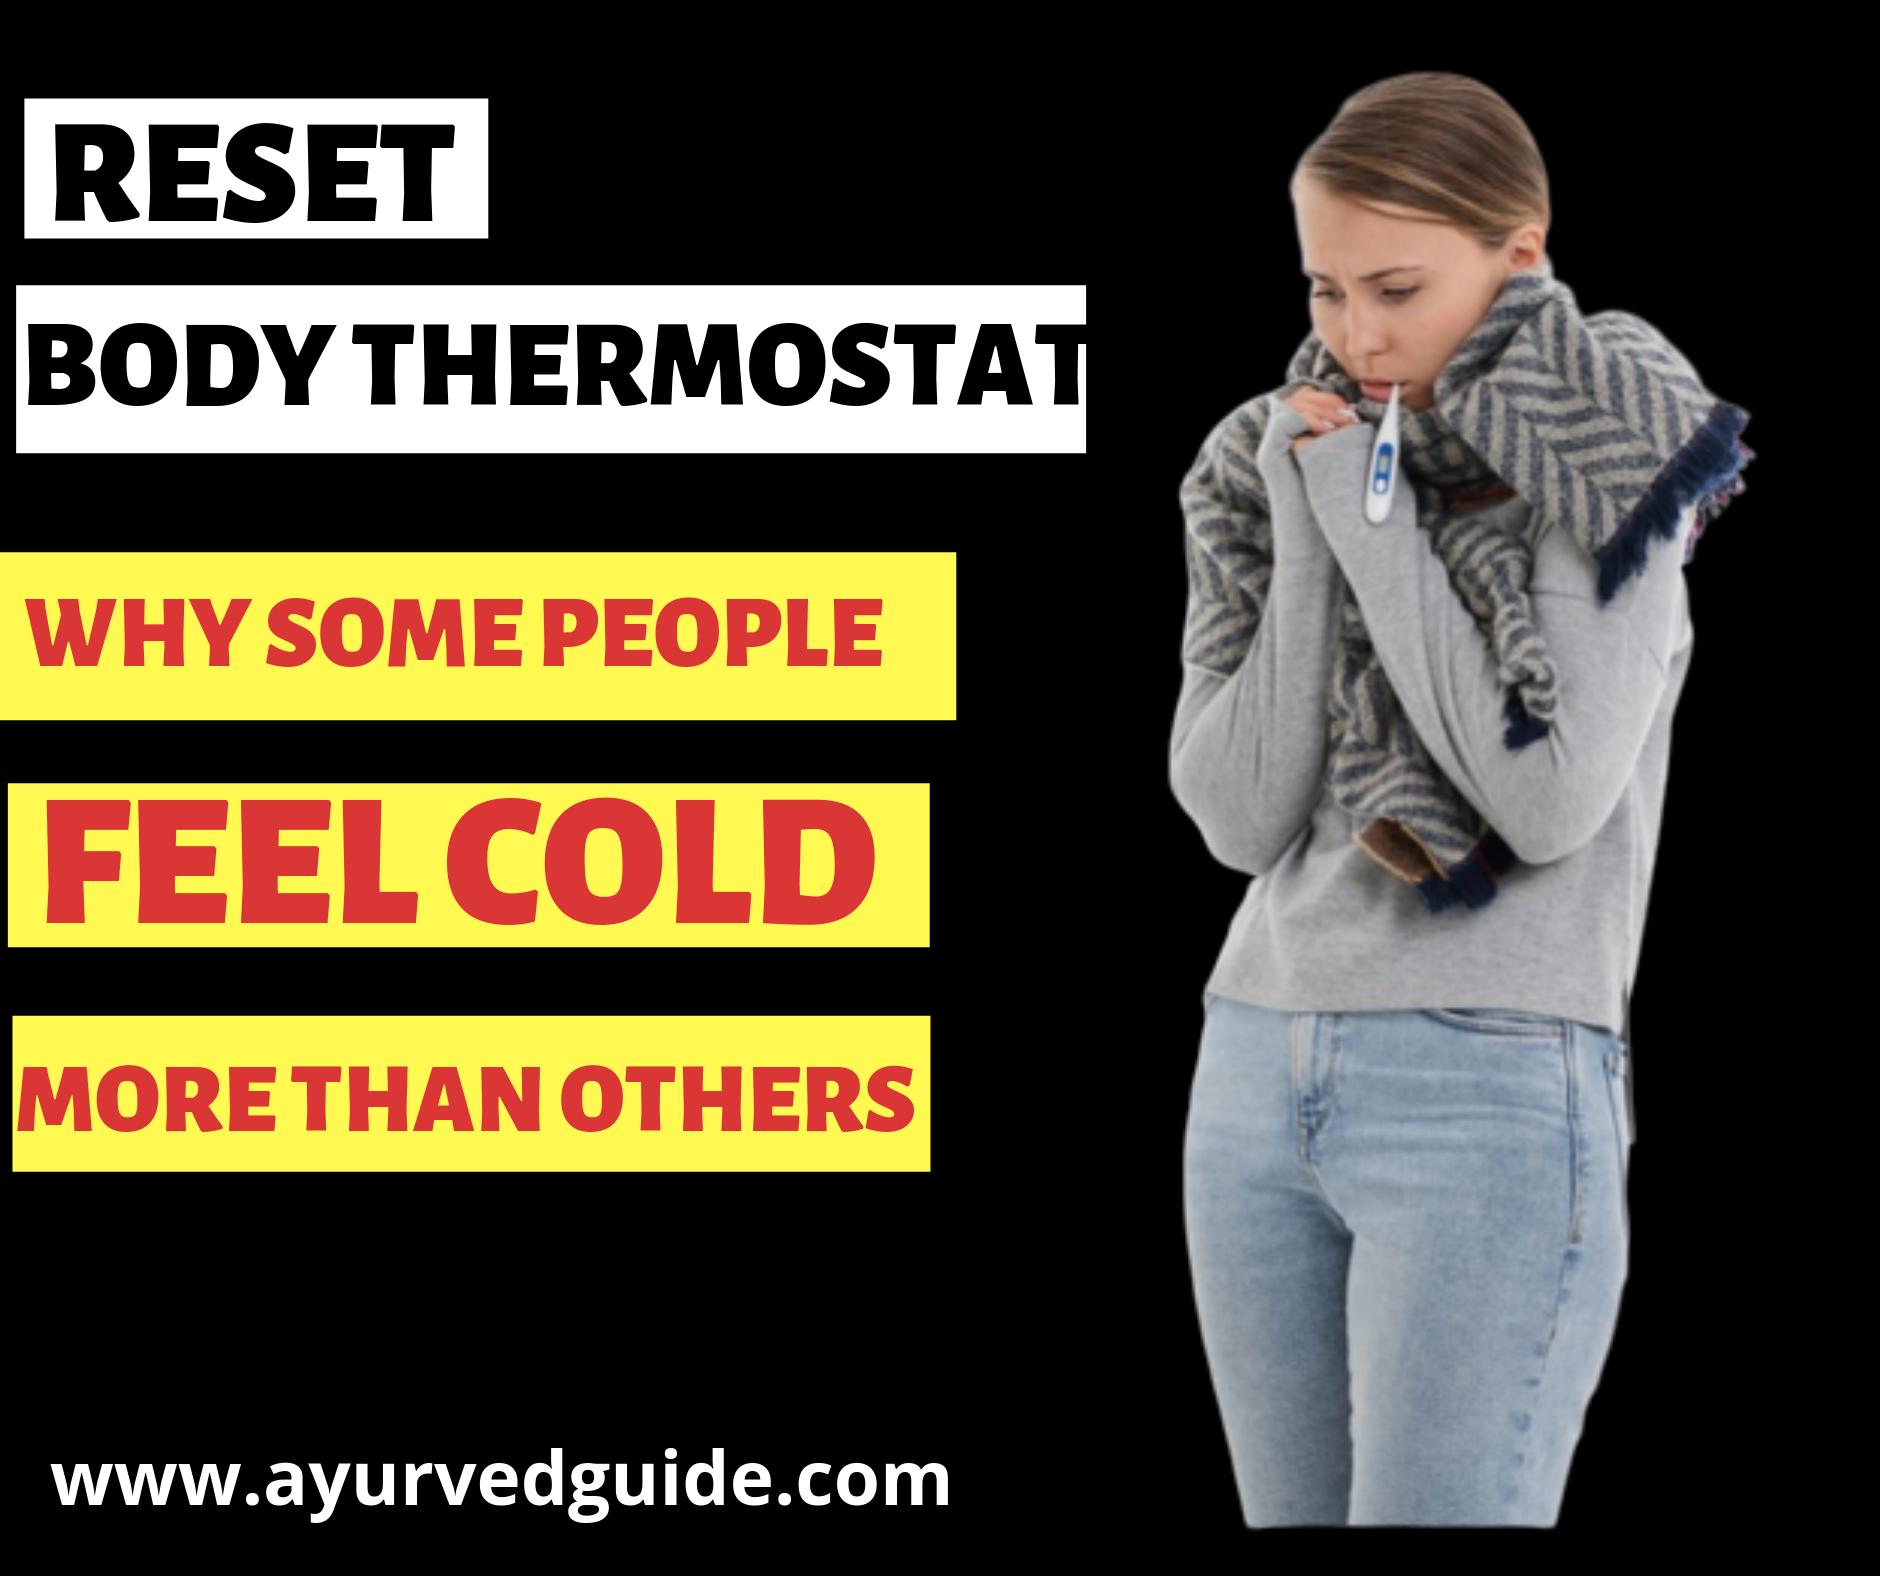 Reset Body Thermostat